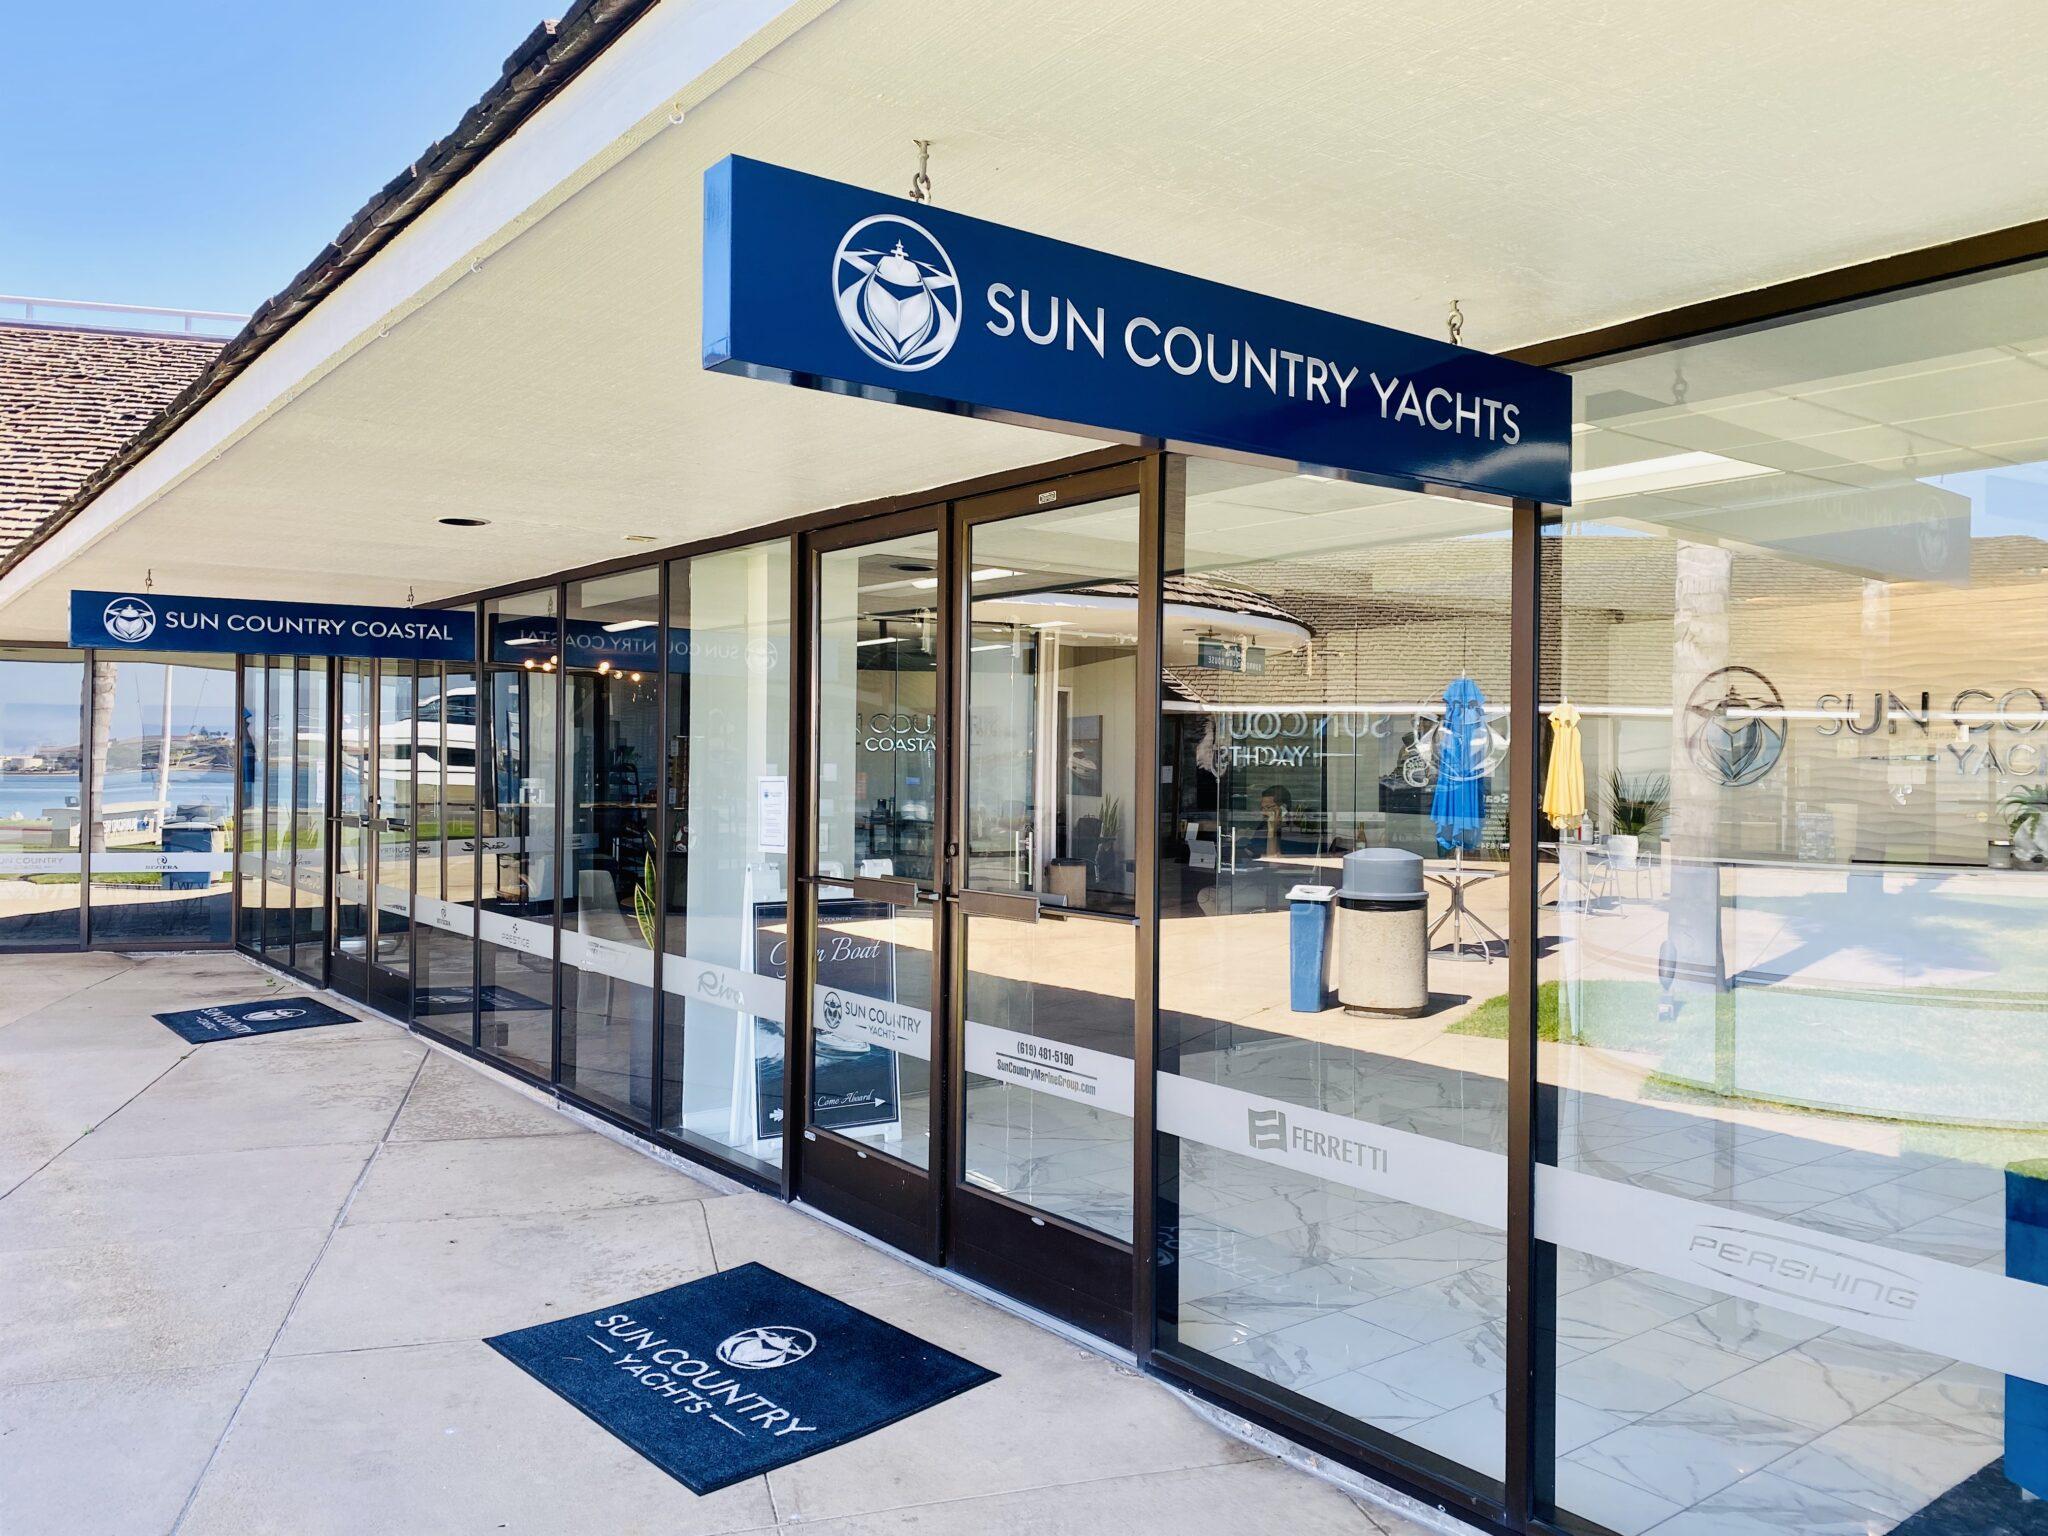 Sun Country Yachts, San Diego